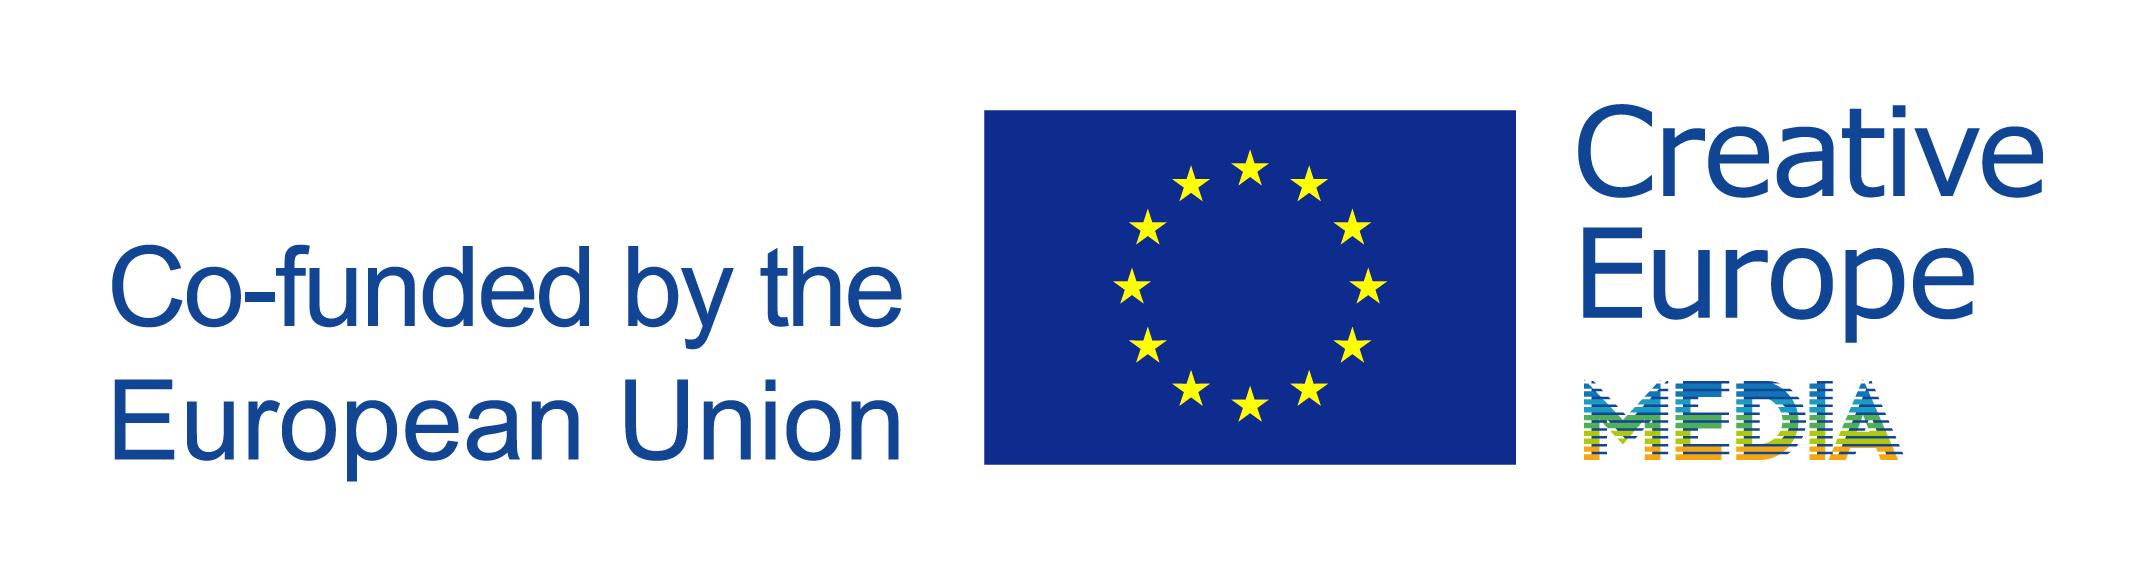 eu_flag_creative_europe_media_co_funded_en_[rgb]_-2.jpg